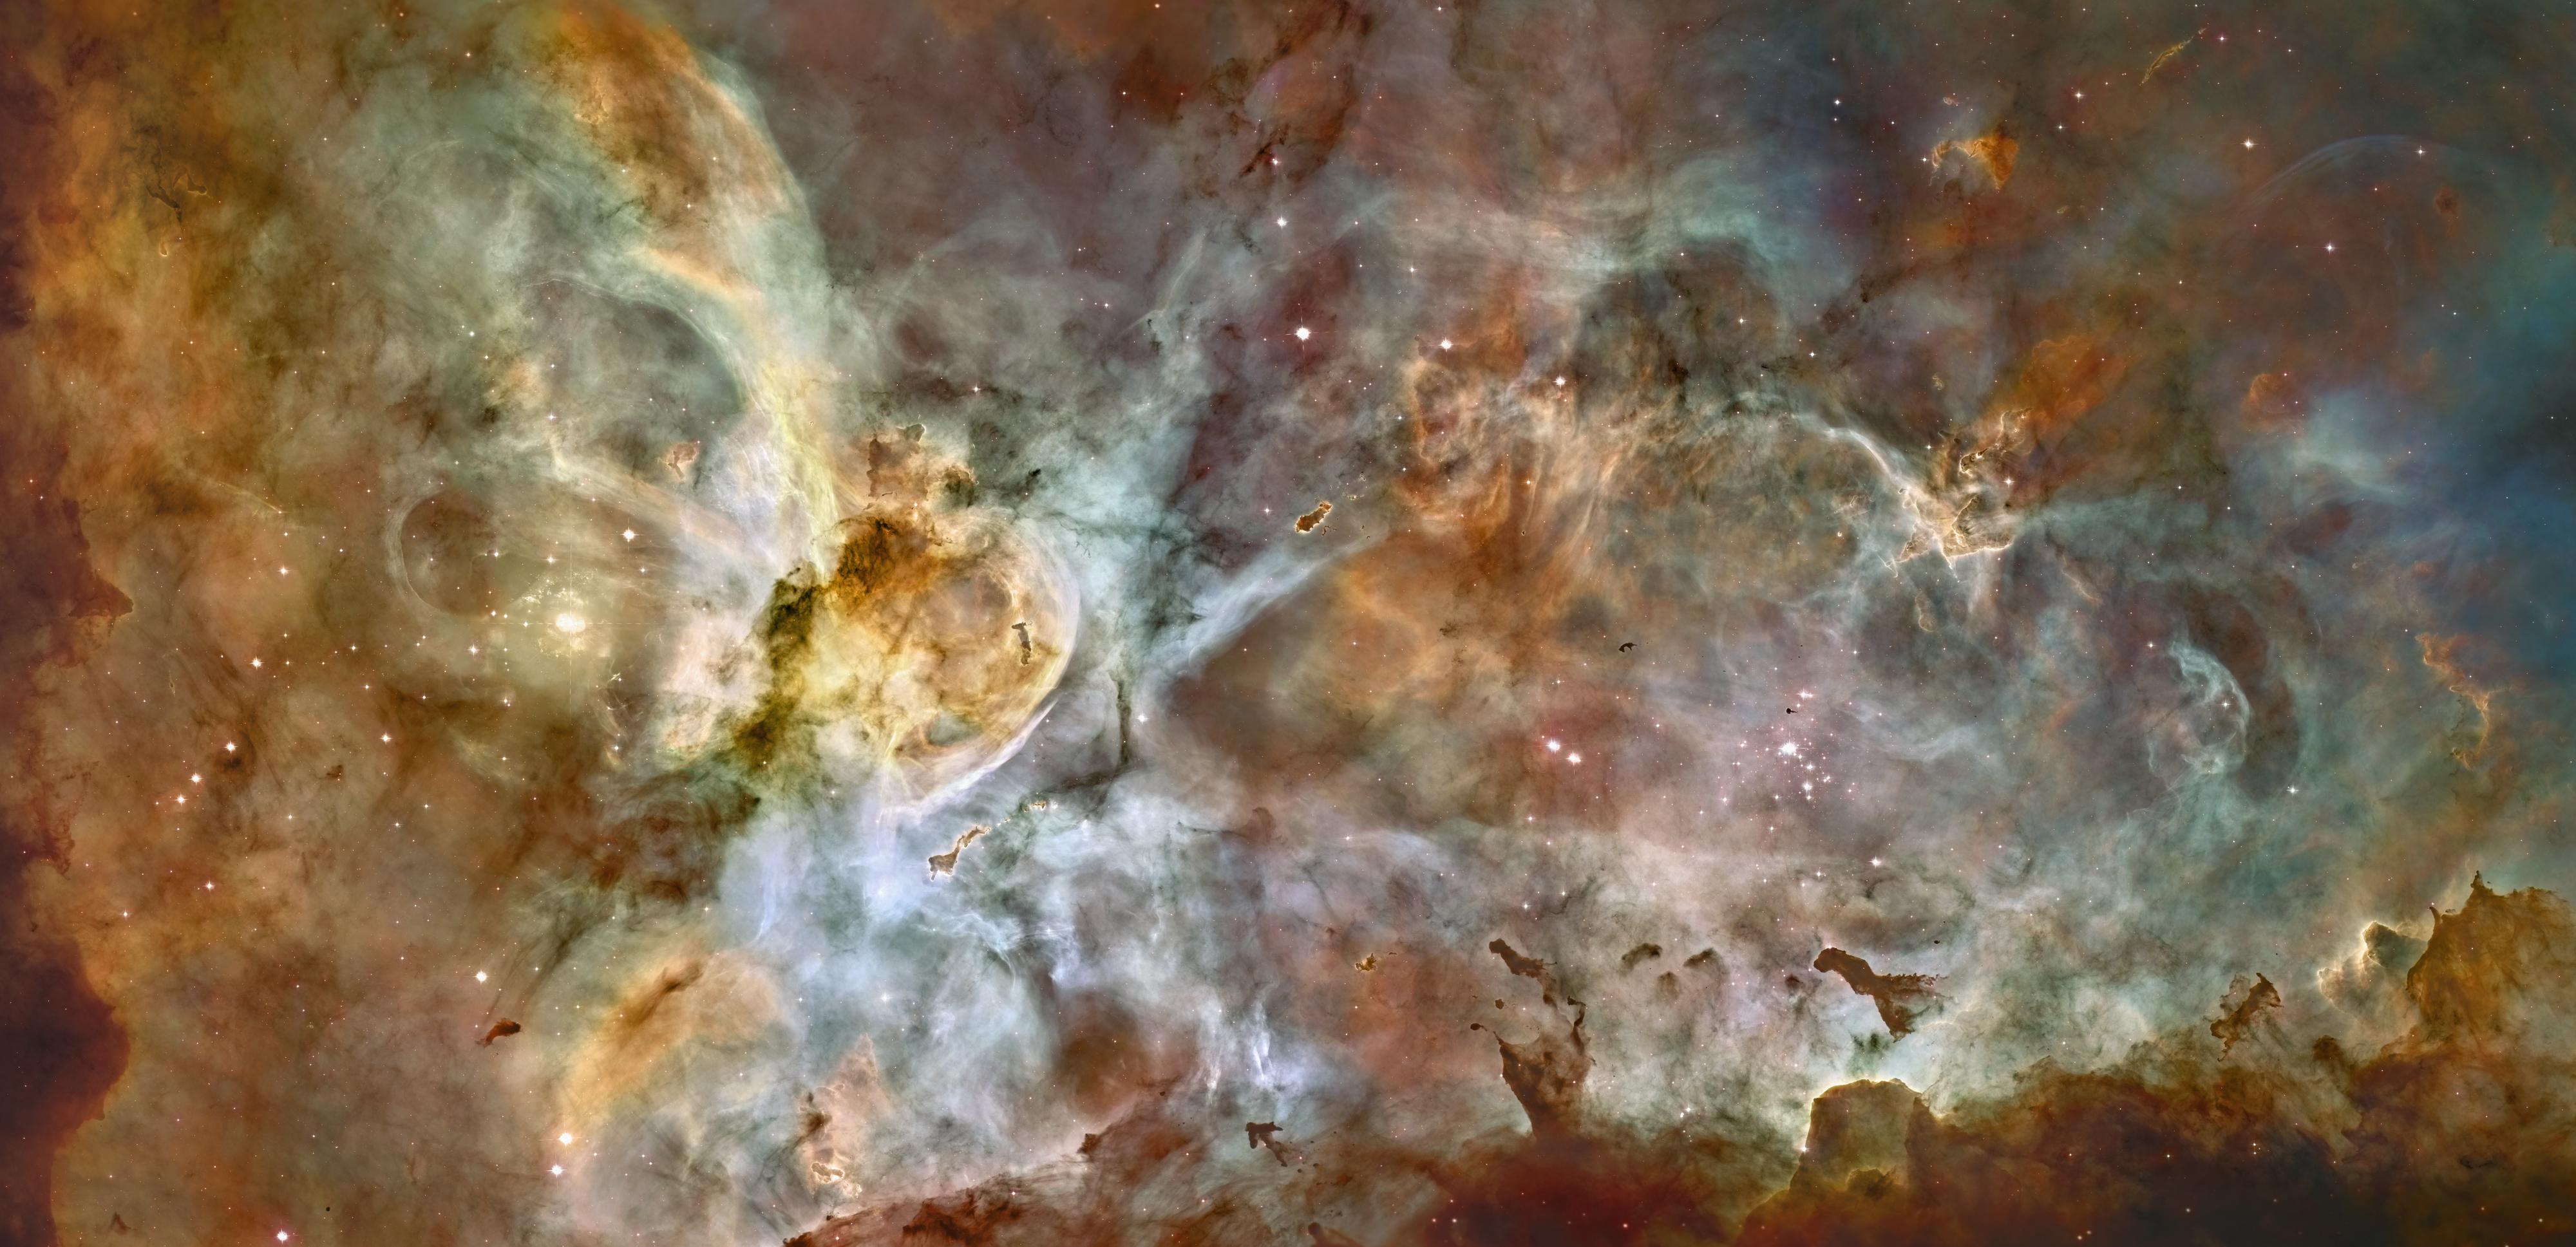 eagle nebula star birth - photo #19